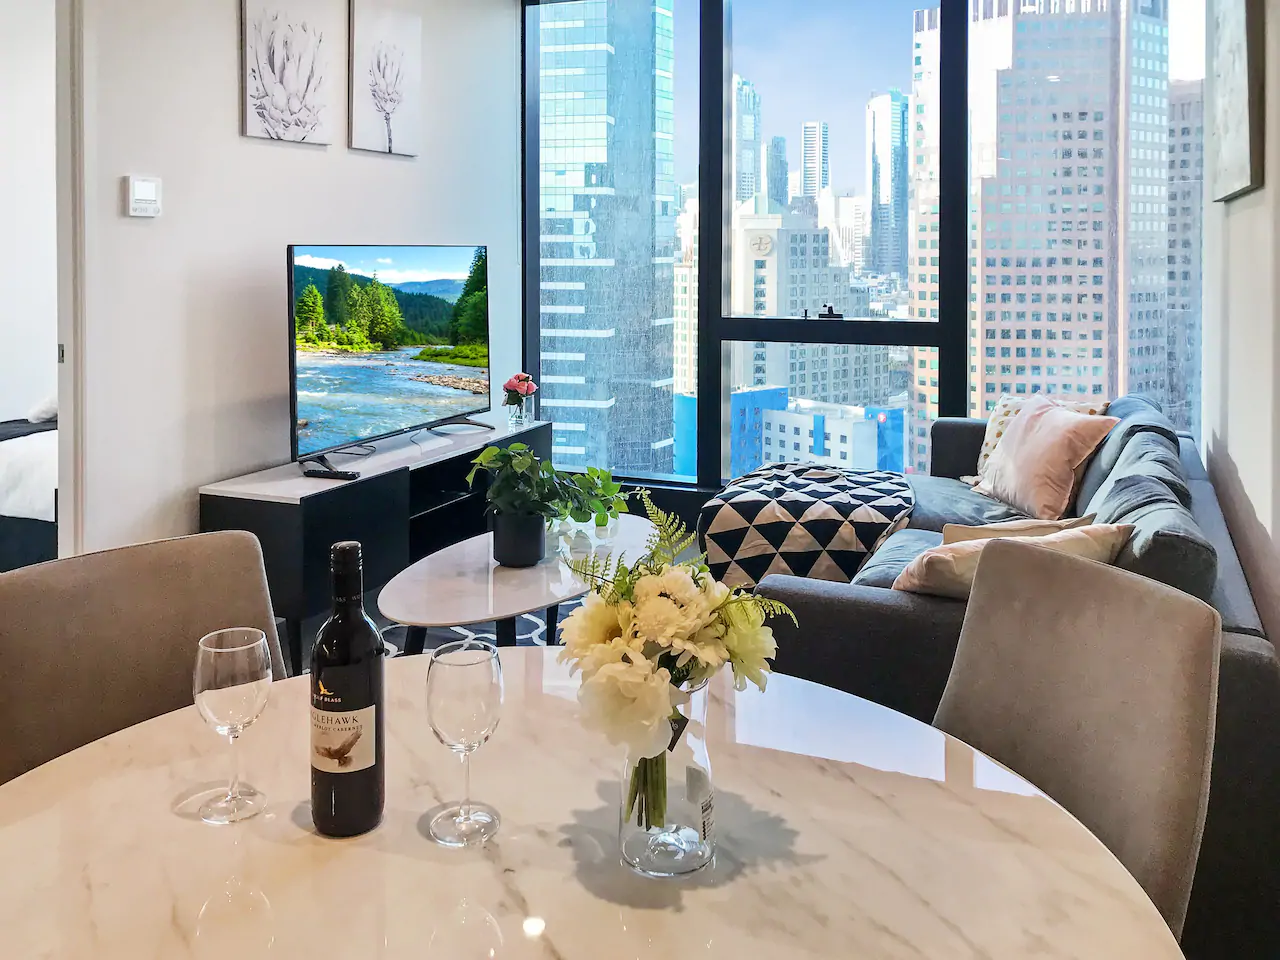 FREE Wine+Netflix+Wifi+Views+Pool+Casino